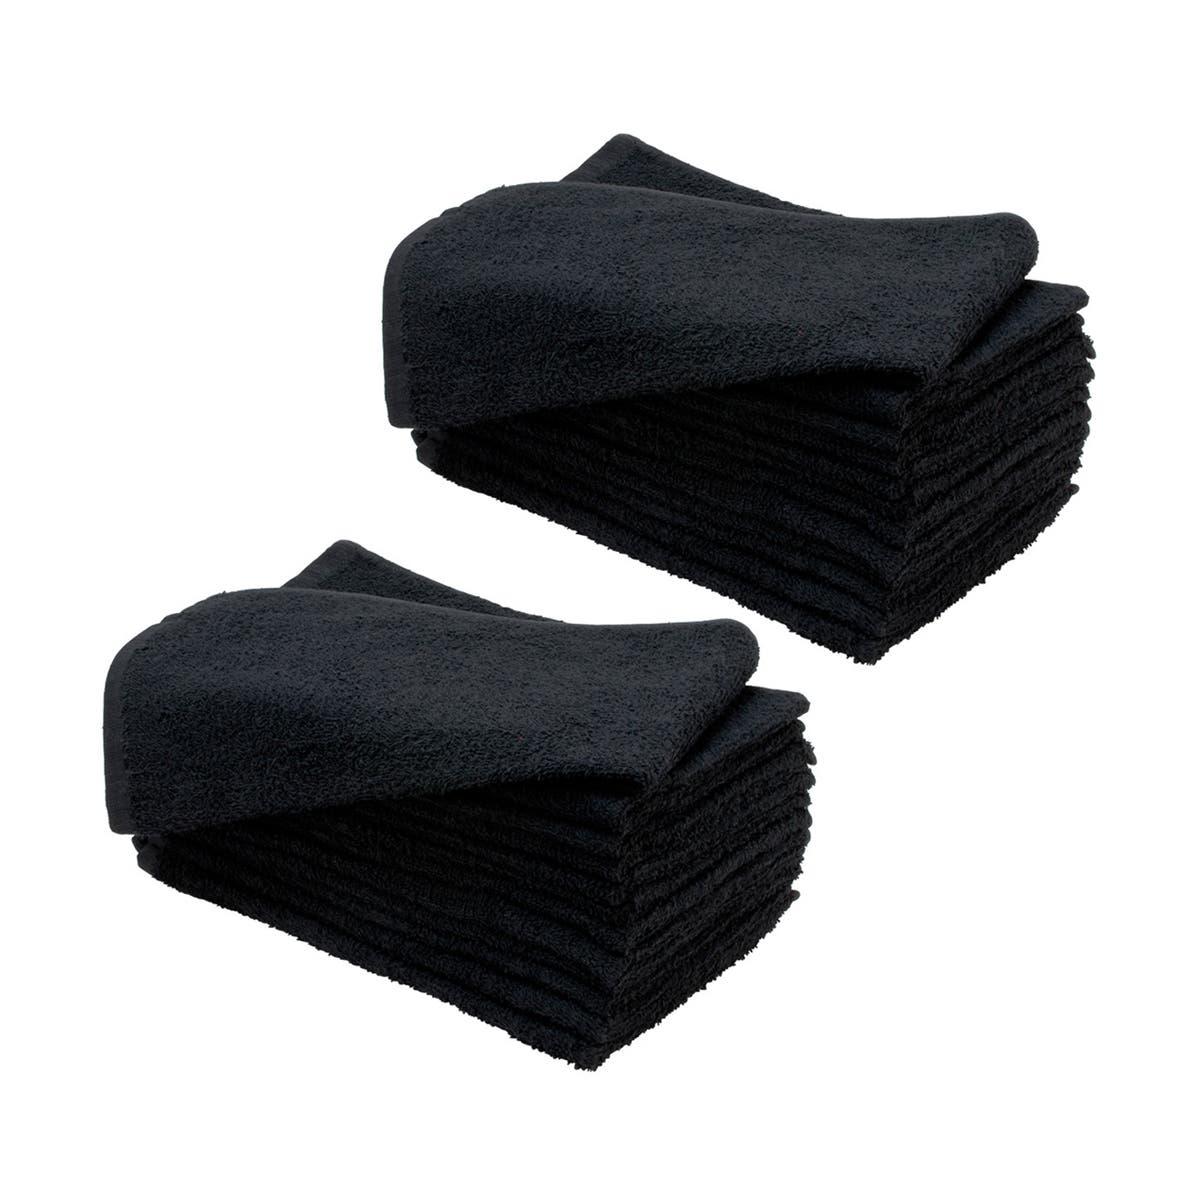 SydneySalonSupplies 135g LUXE BLACK Hand Towels 100% Cotton Hair/Barber/Beauty/Gym